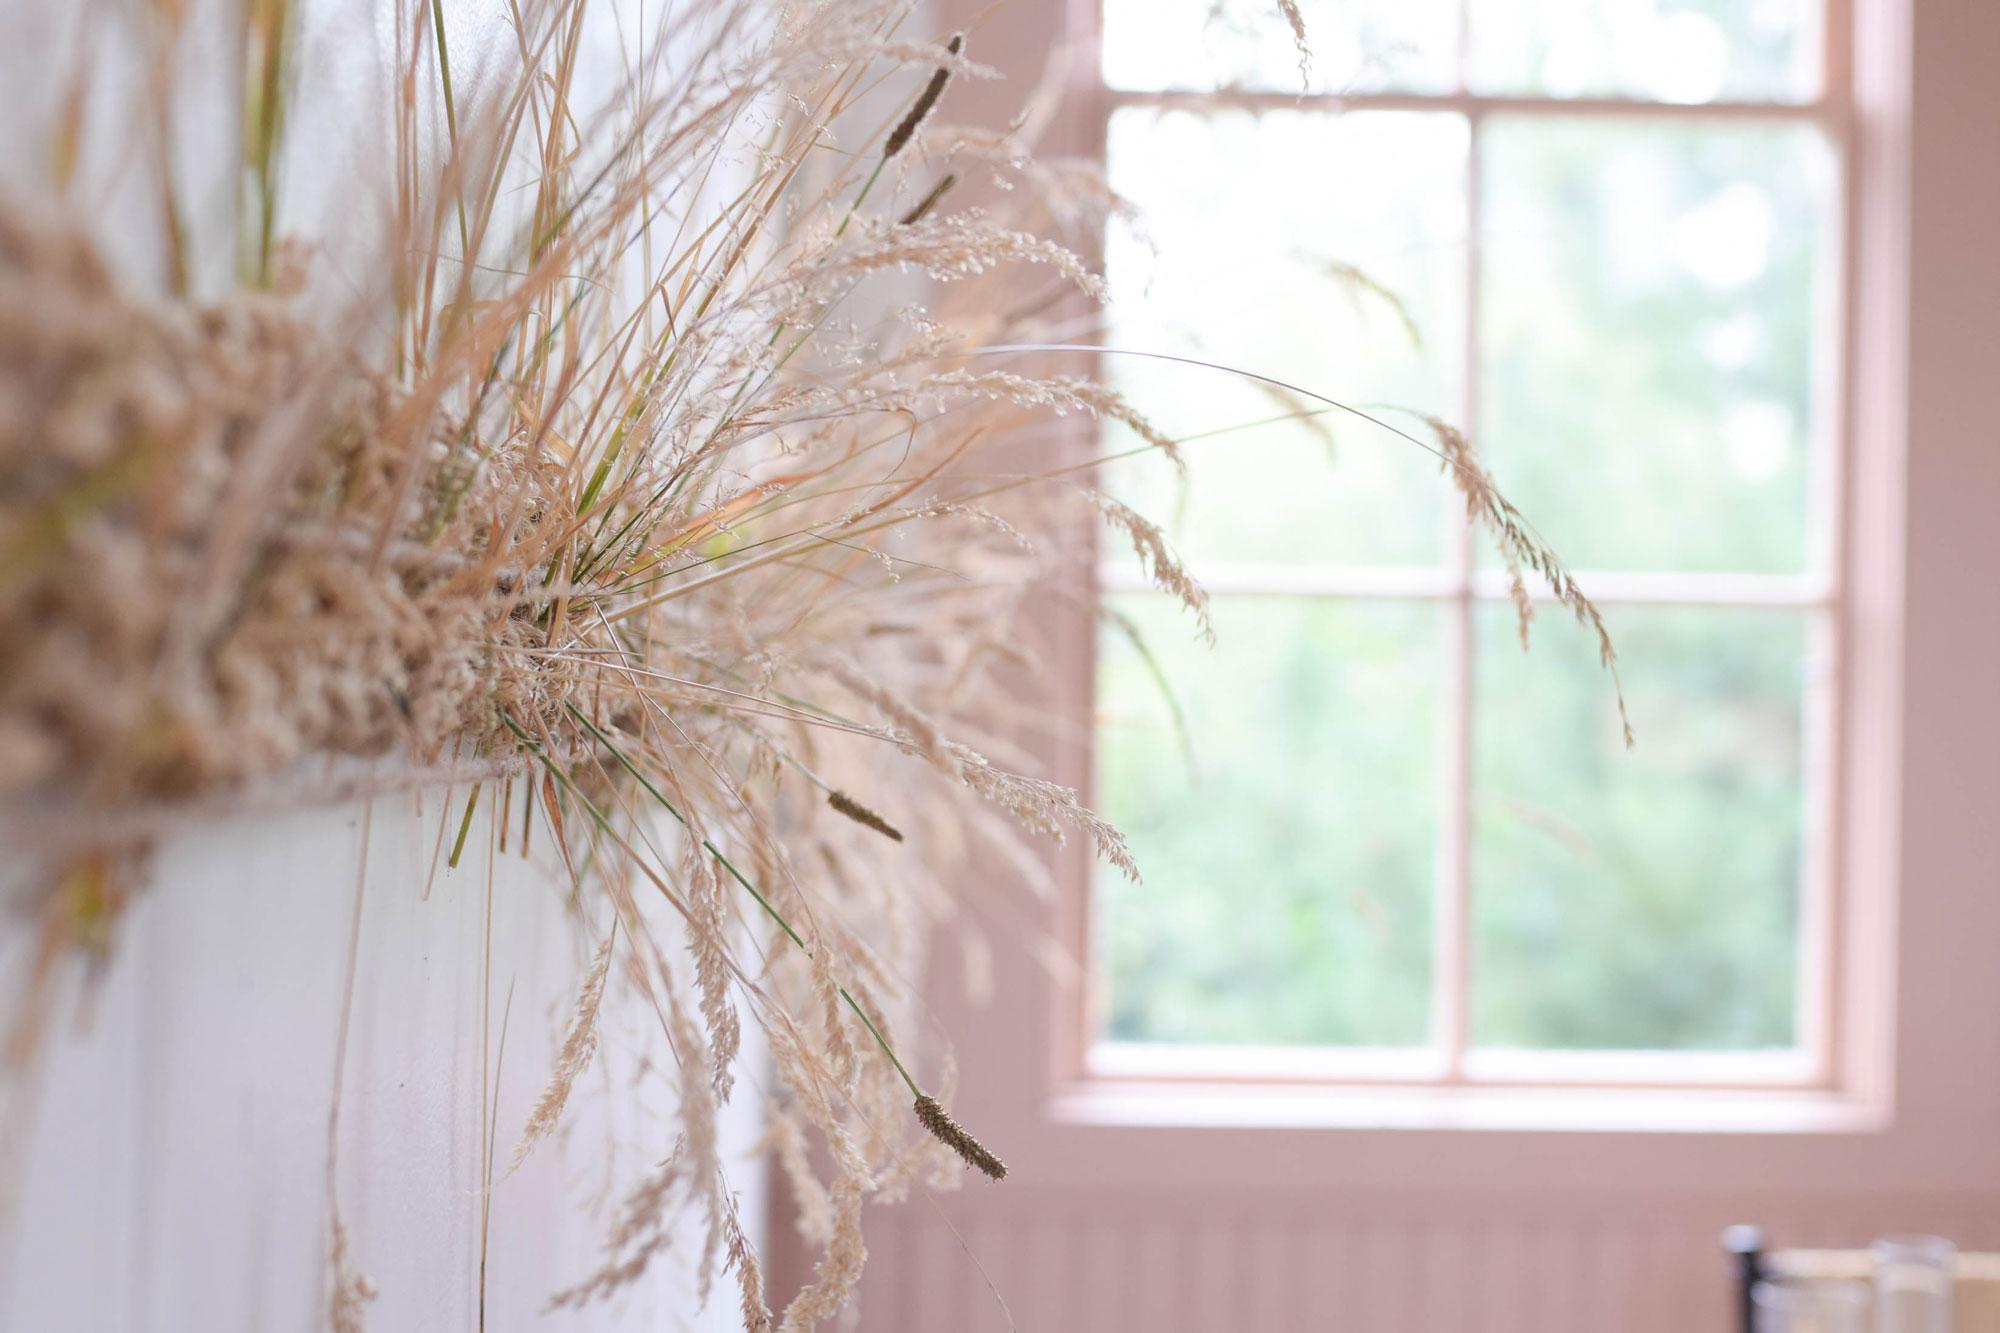 BBJ-Photoshoot--Curious-Lola---Grass-(8)